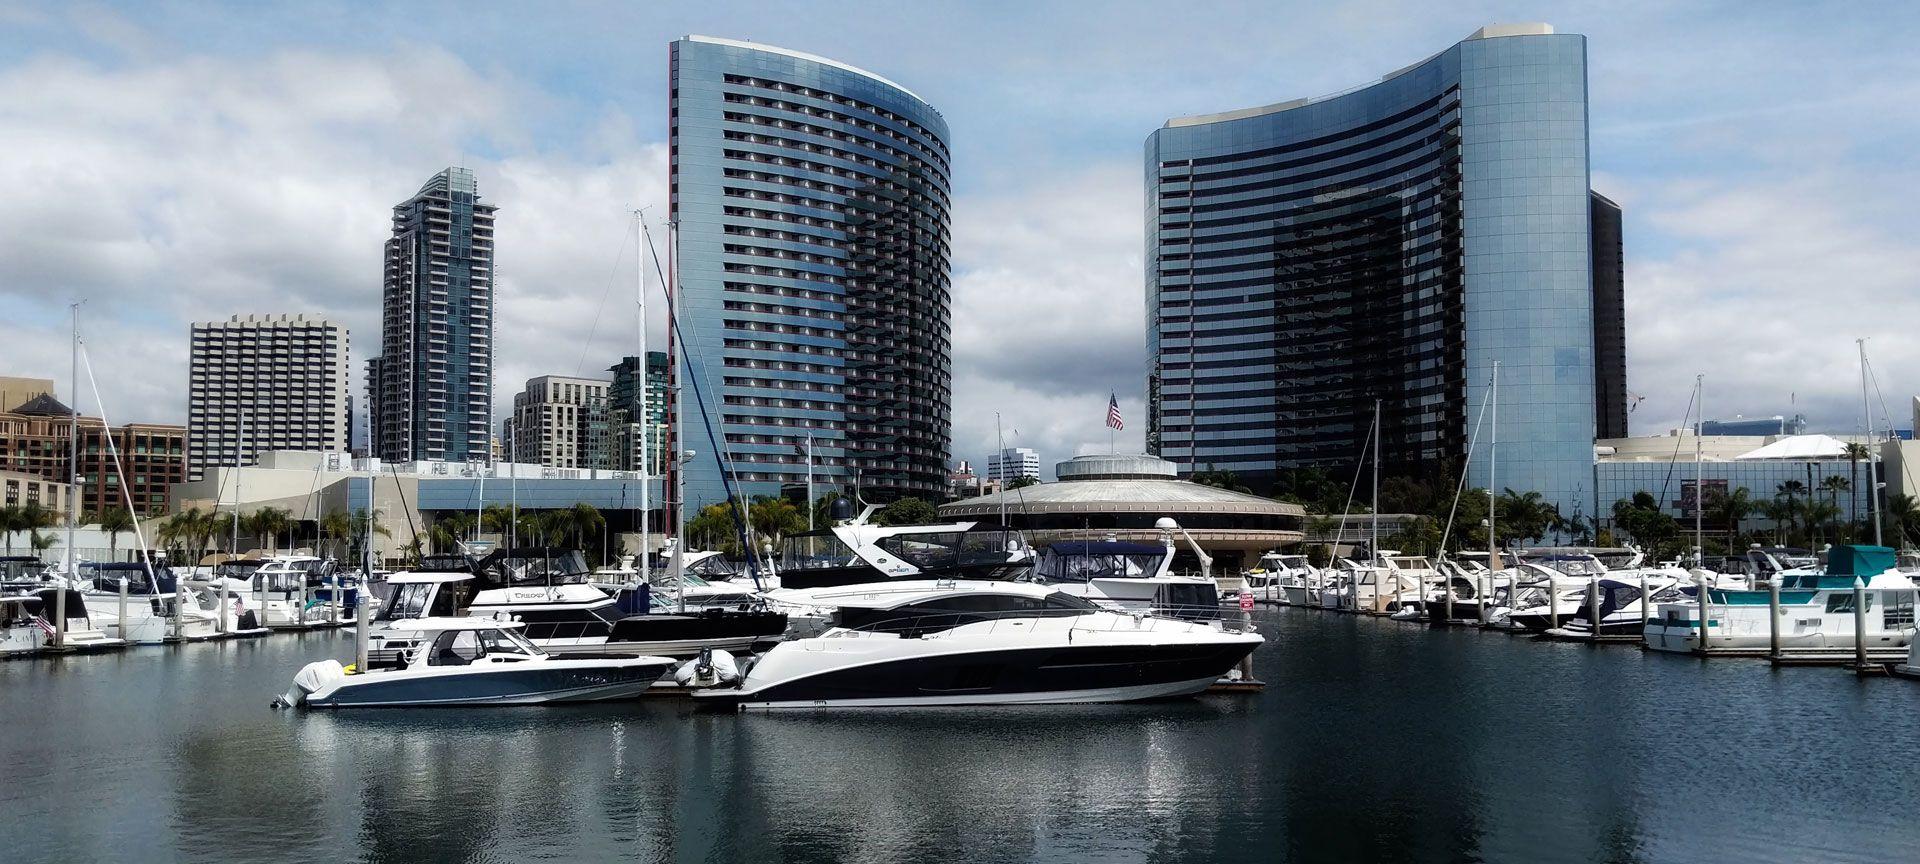 PageTopper-Yachts4Charter.jpg